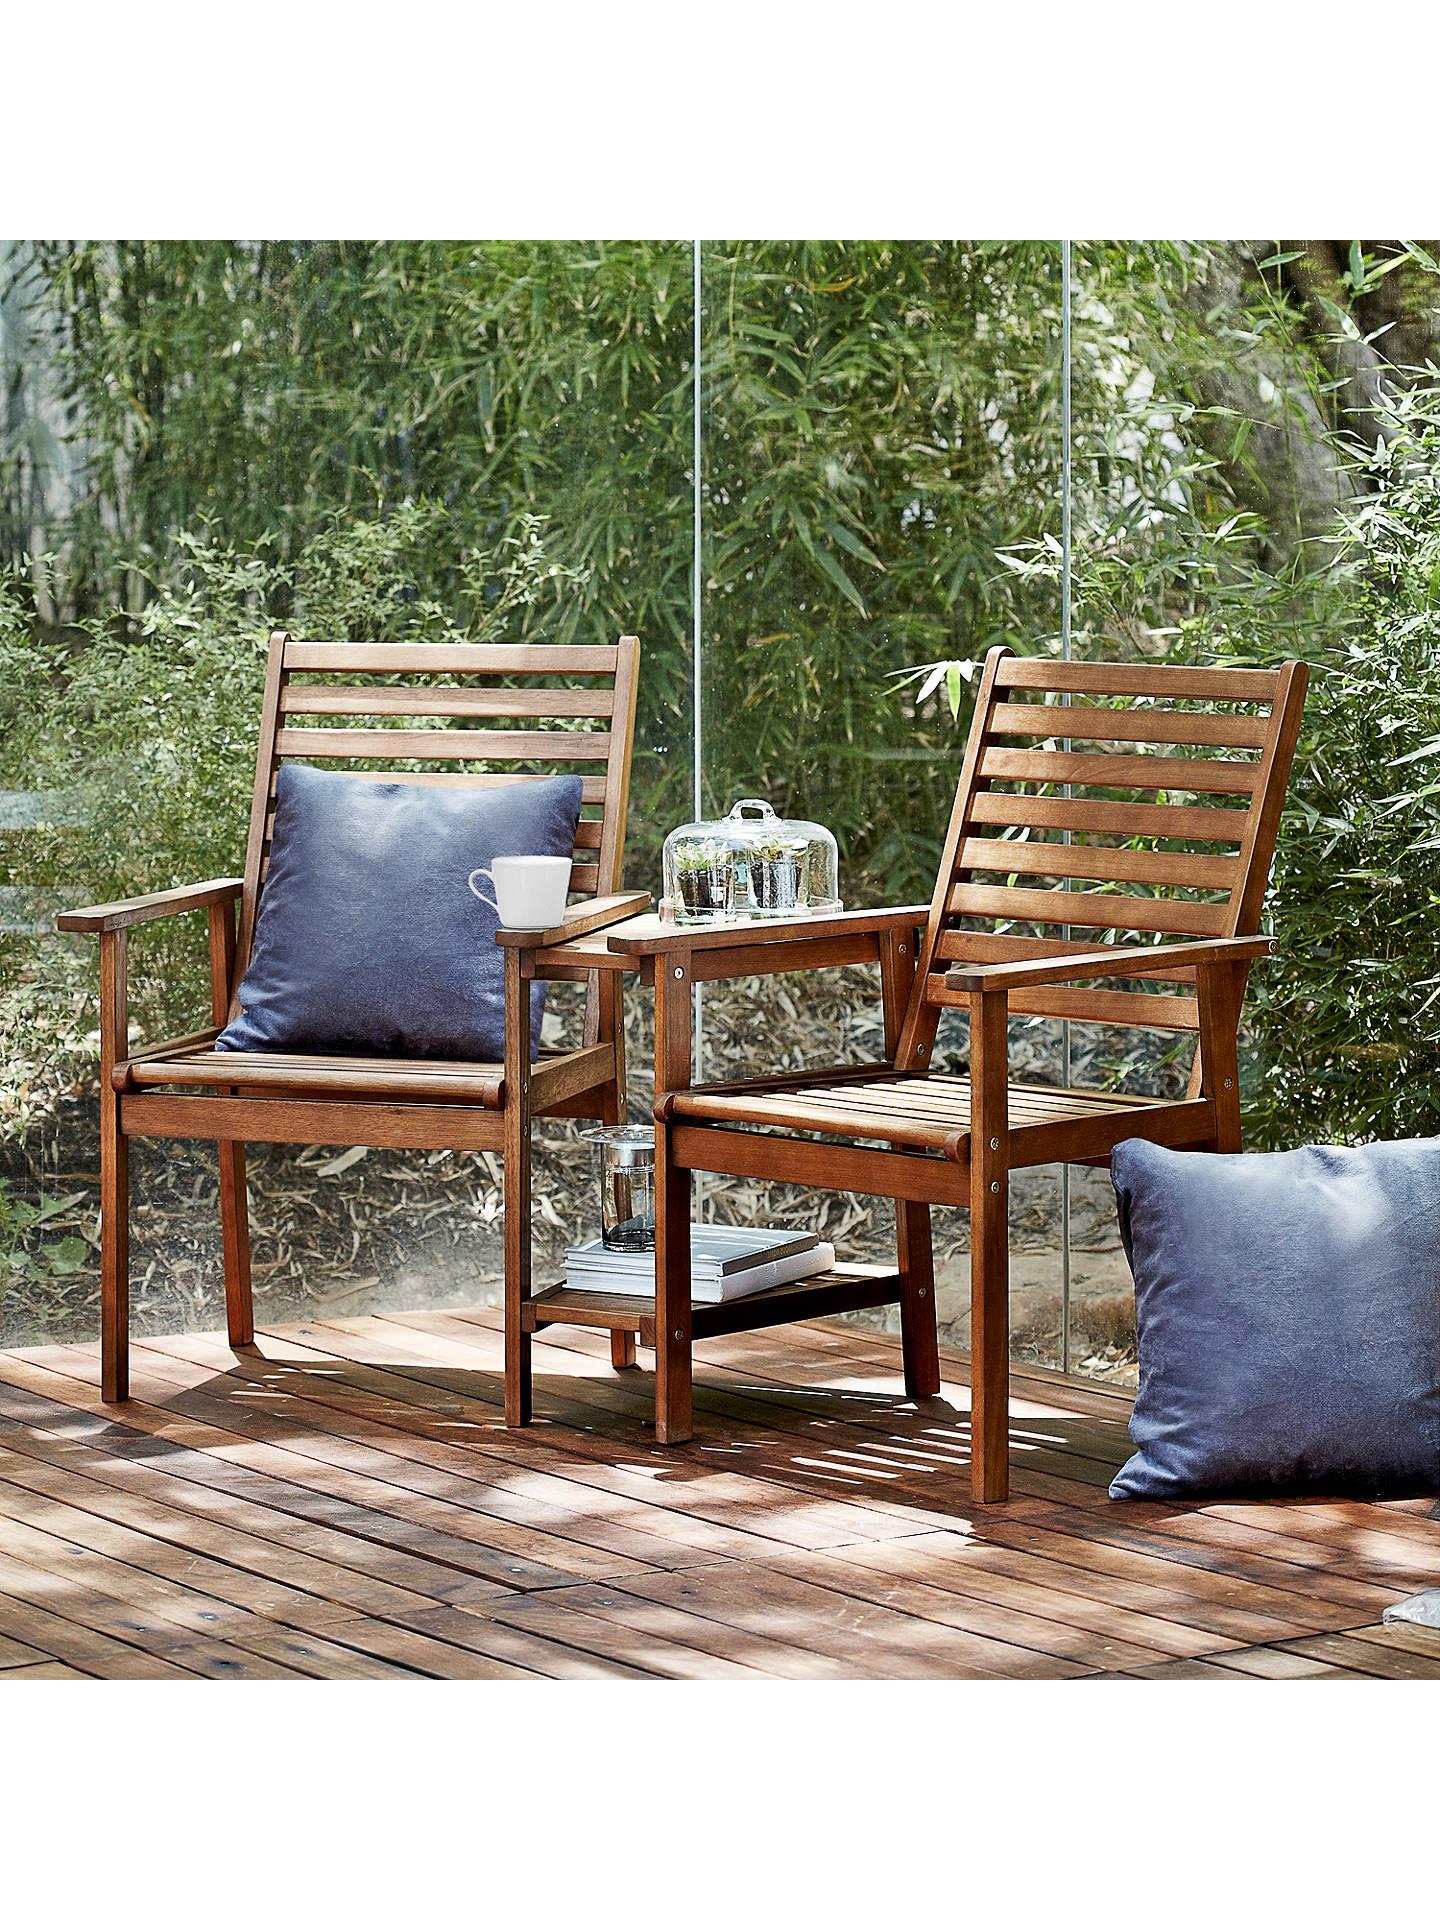 John Lewis & Partners Naples Outdoor Love Seats at John Lewis & Partners